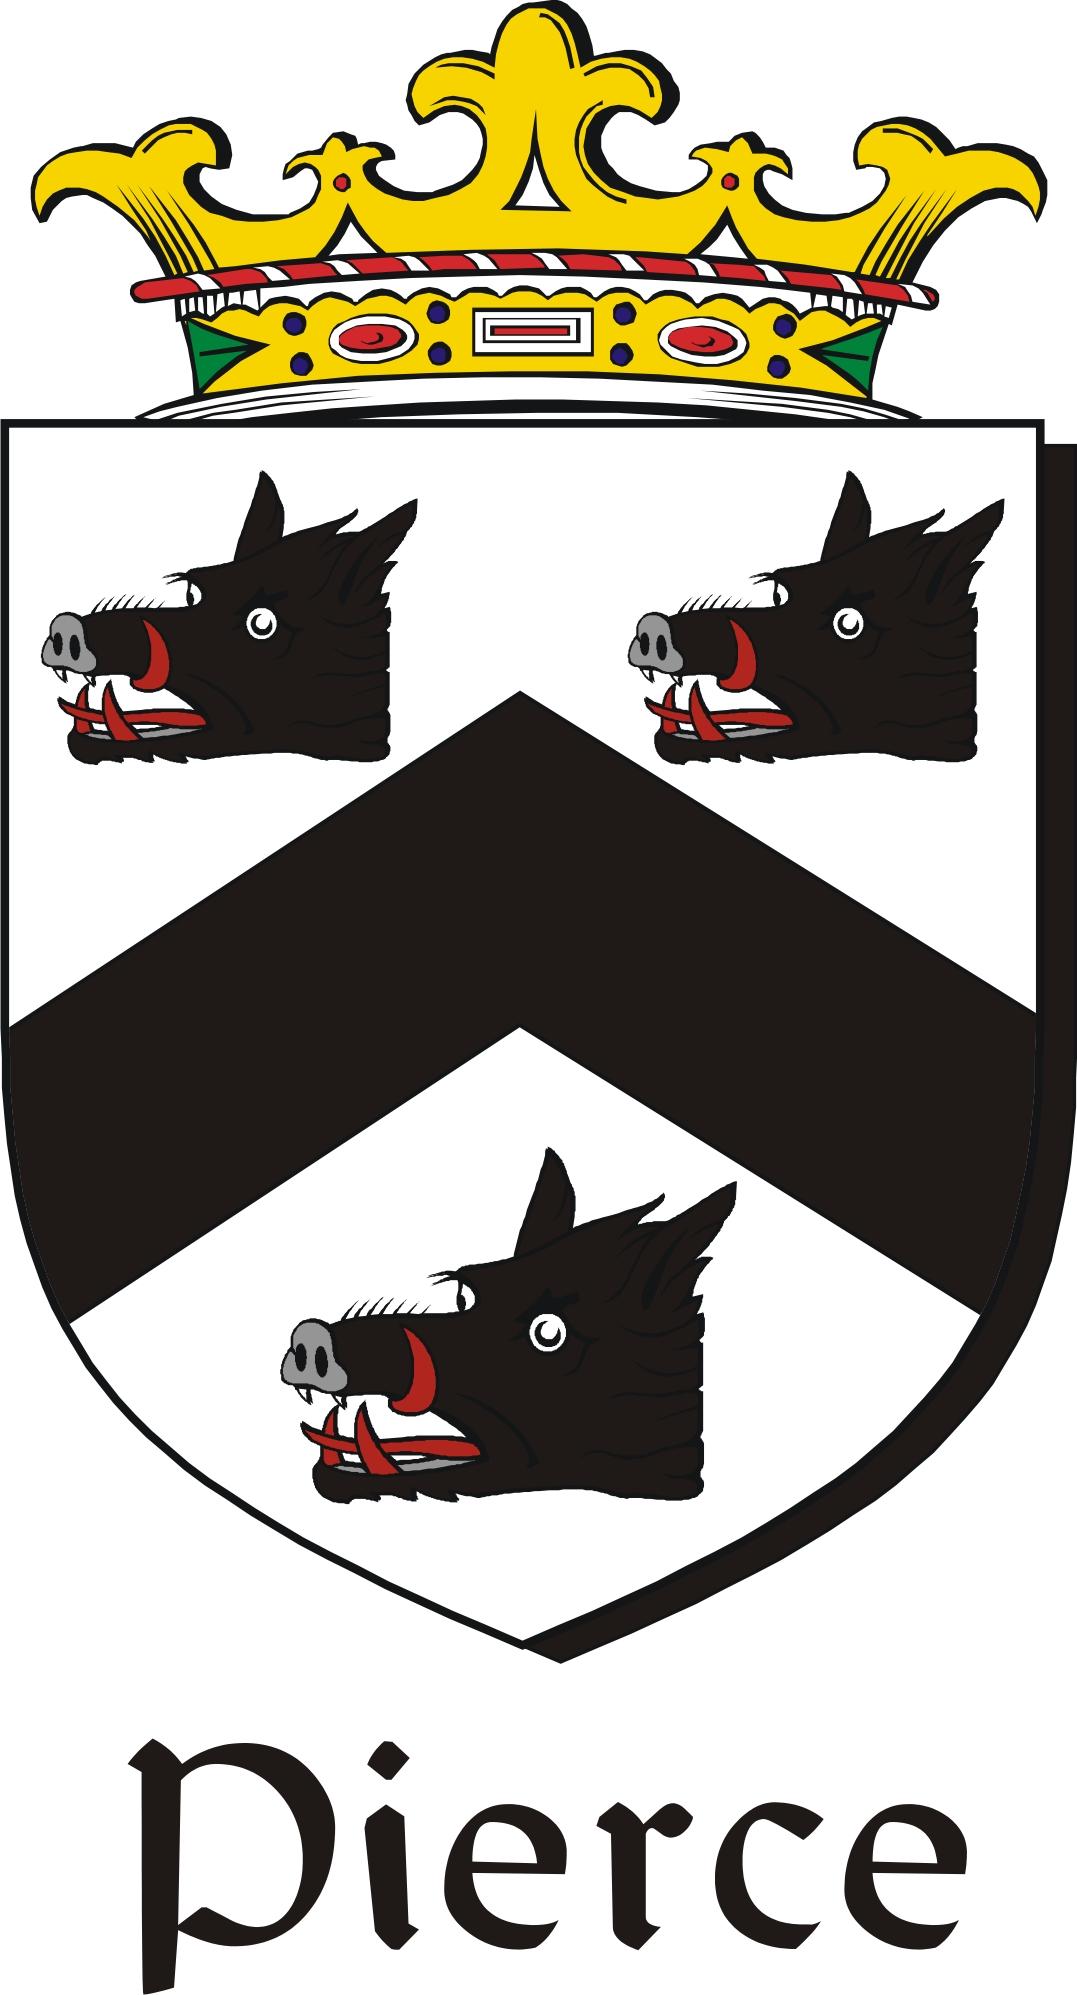 pierce family crest    irish coat of arms image download